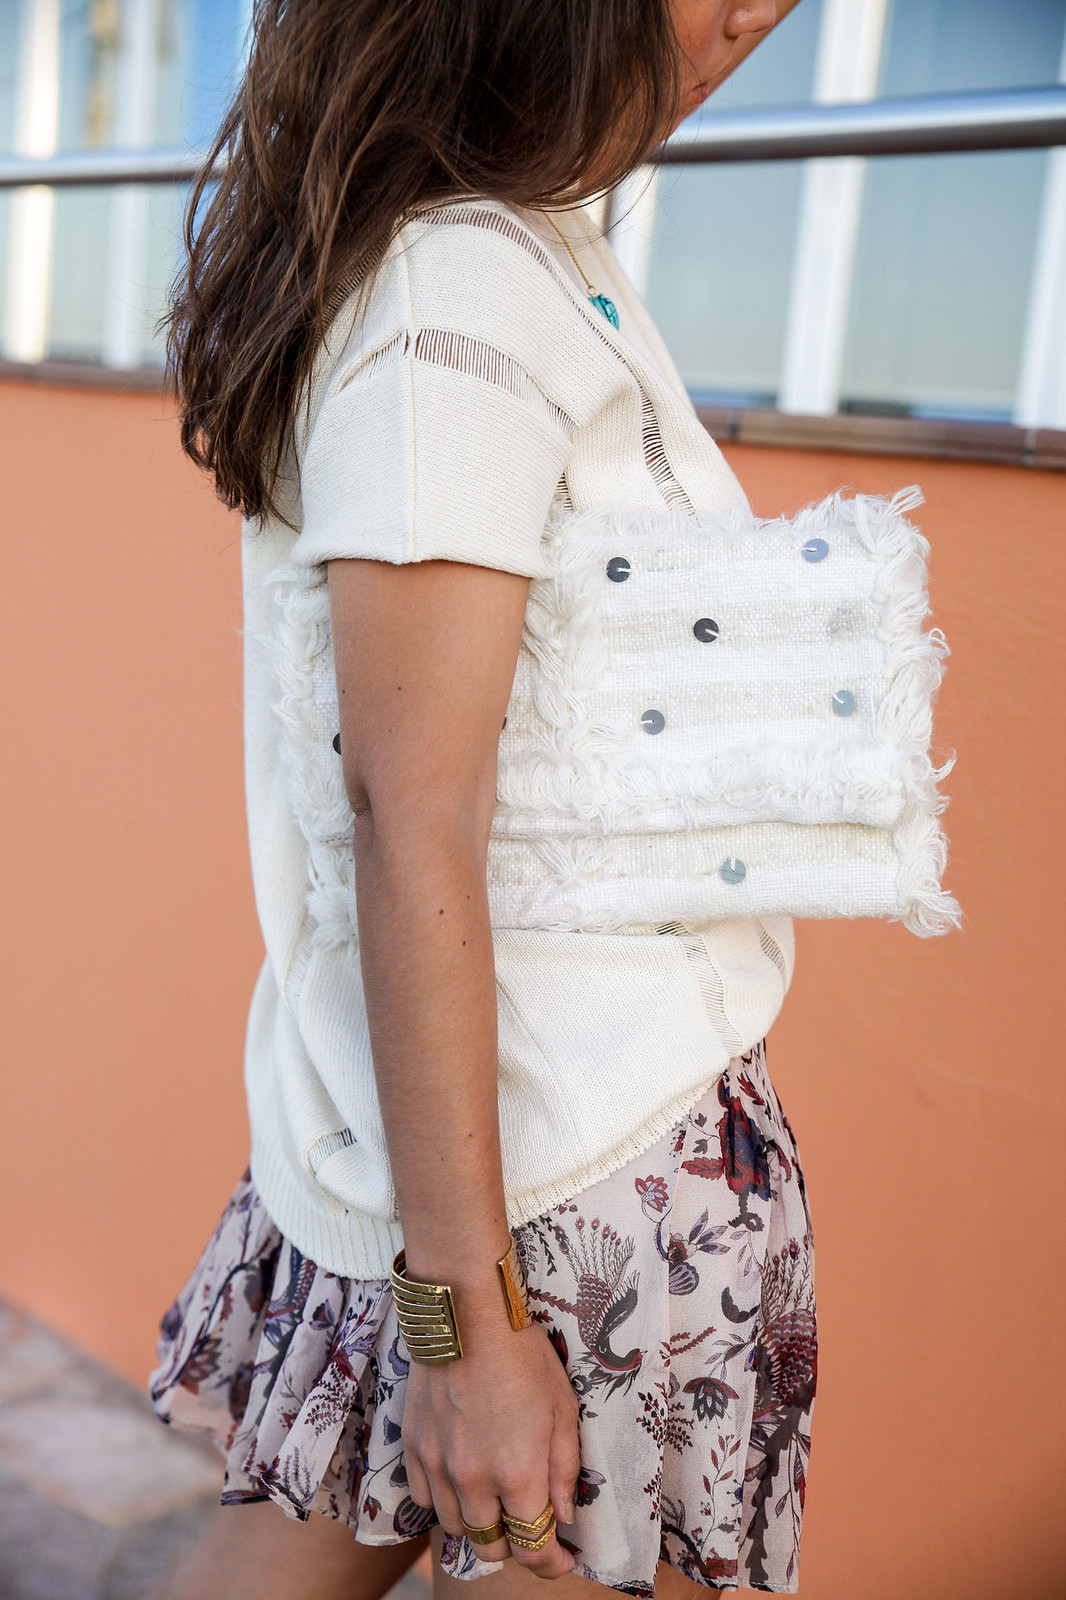 09_blusa_punto_falda_flores_summer_outfit_theguestgirl_rüga_schade_jewels_steve_madden_.magali_pasacal_influencer_barcelona_blogger